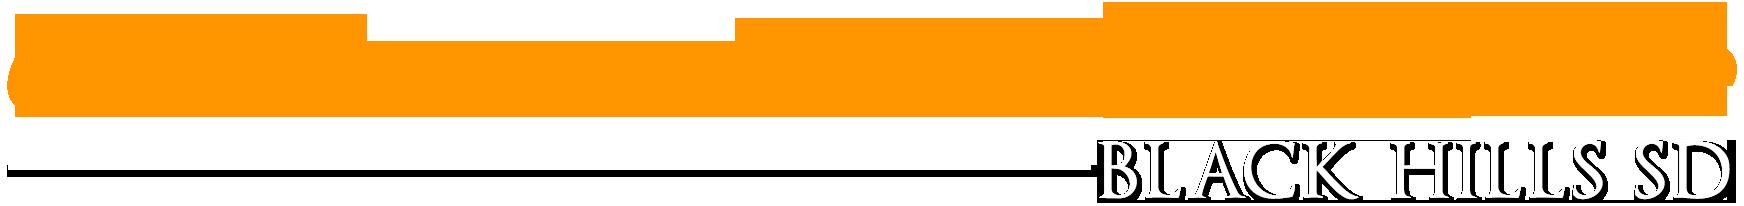 Cn-CBH-Logo-Transp